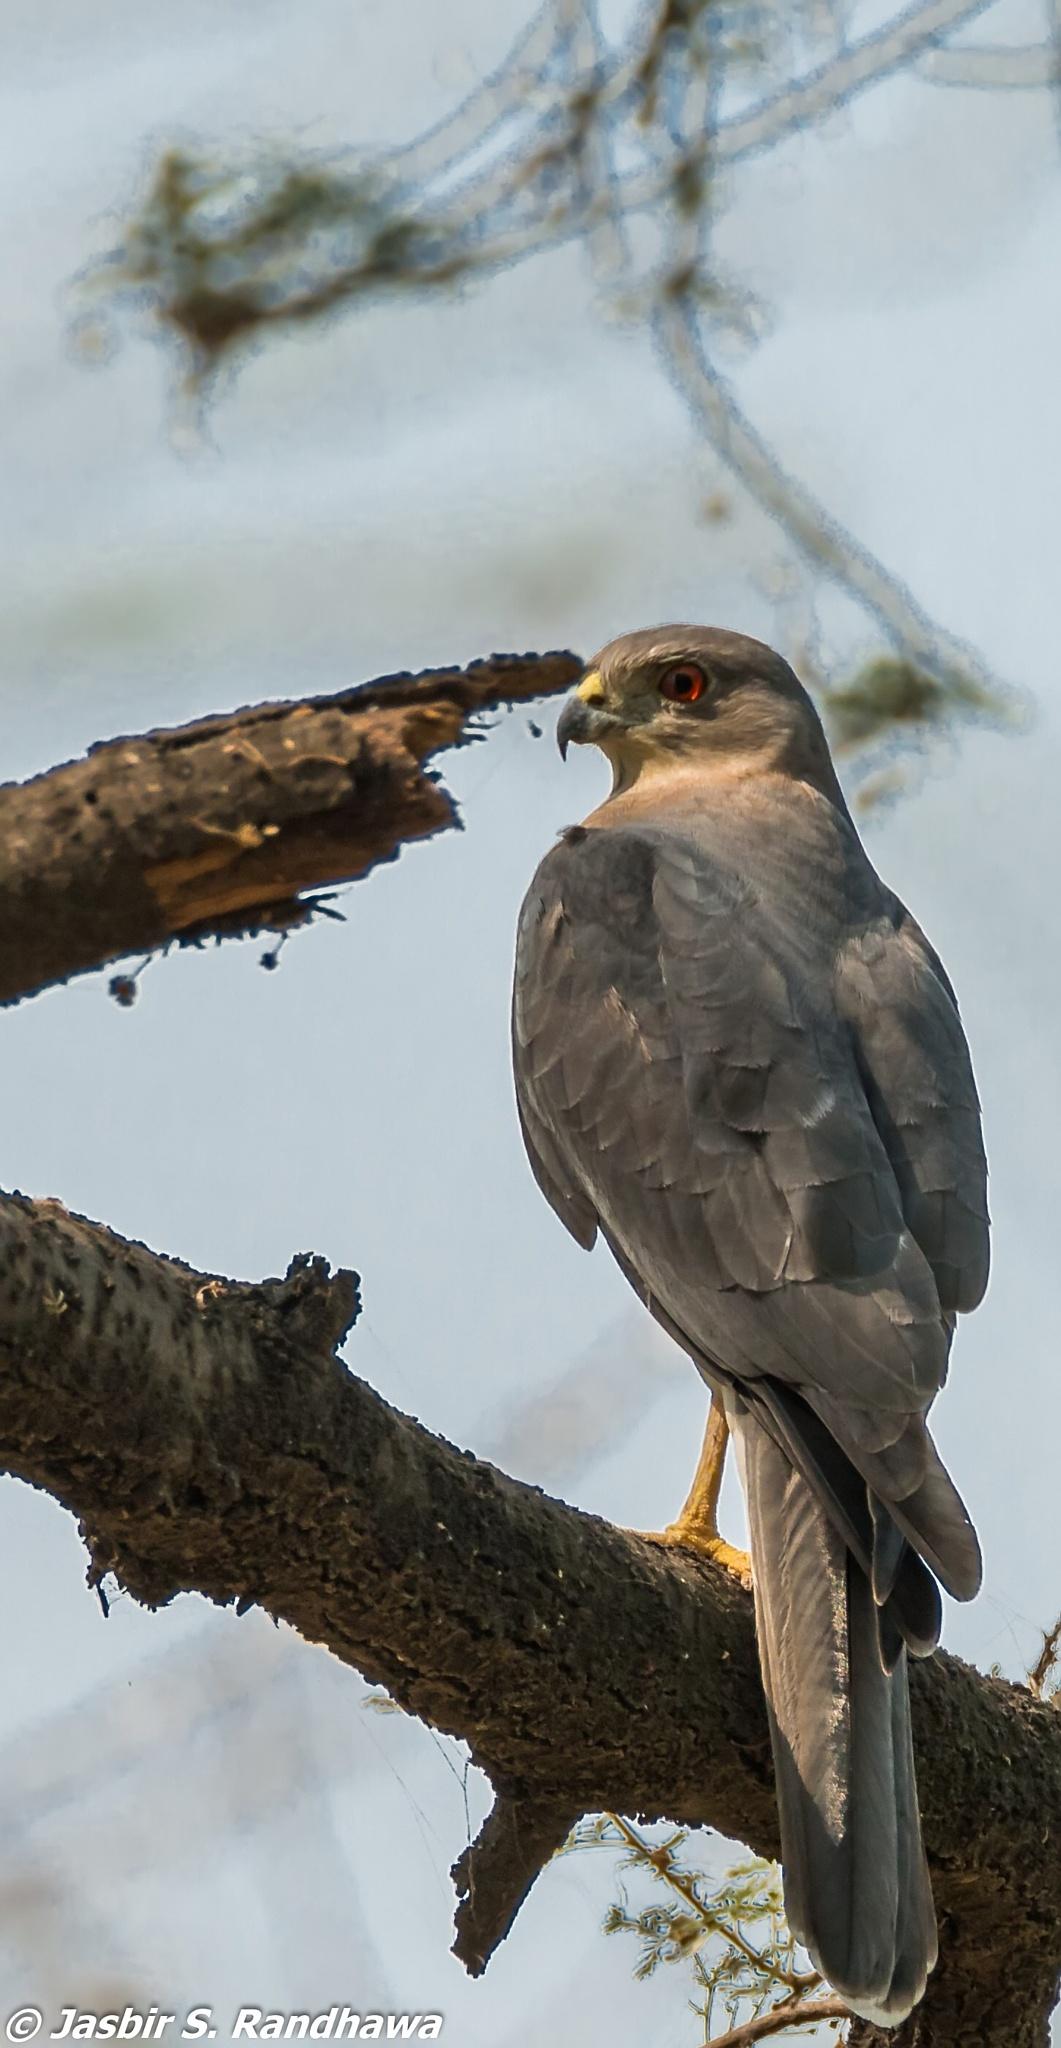 Male Shikra (Accipiter badius) by Jasbir S. Randhawa